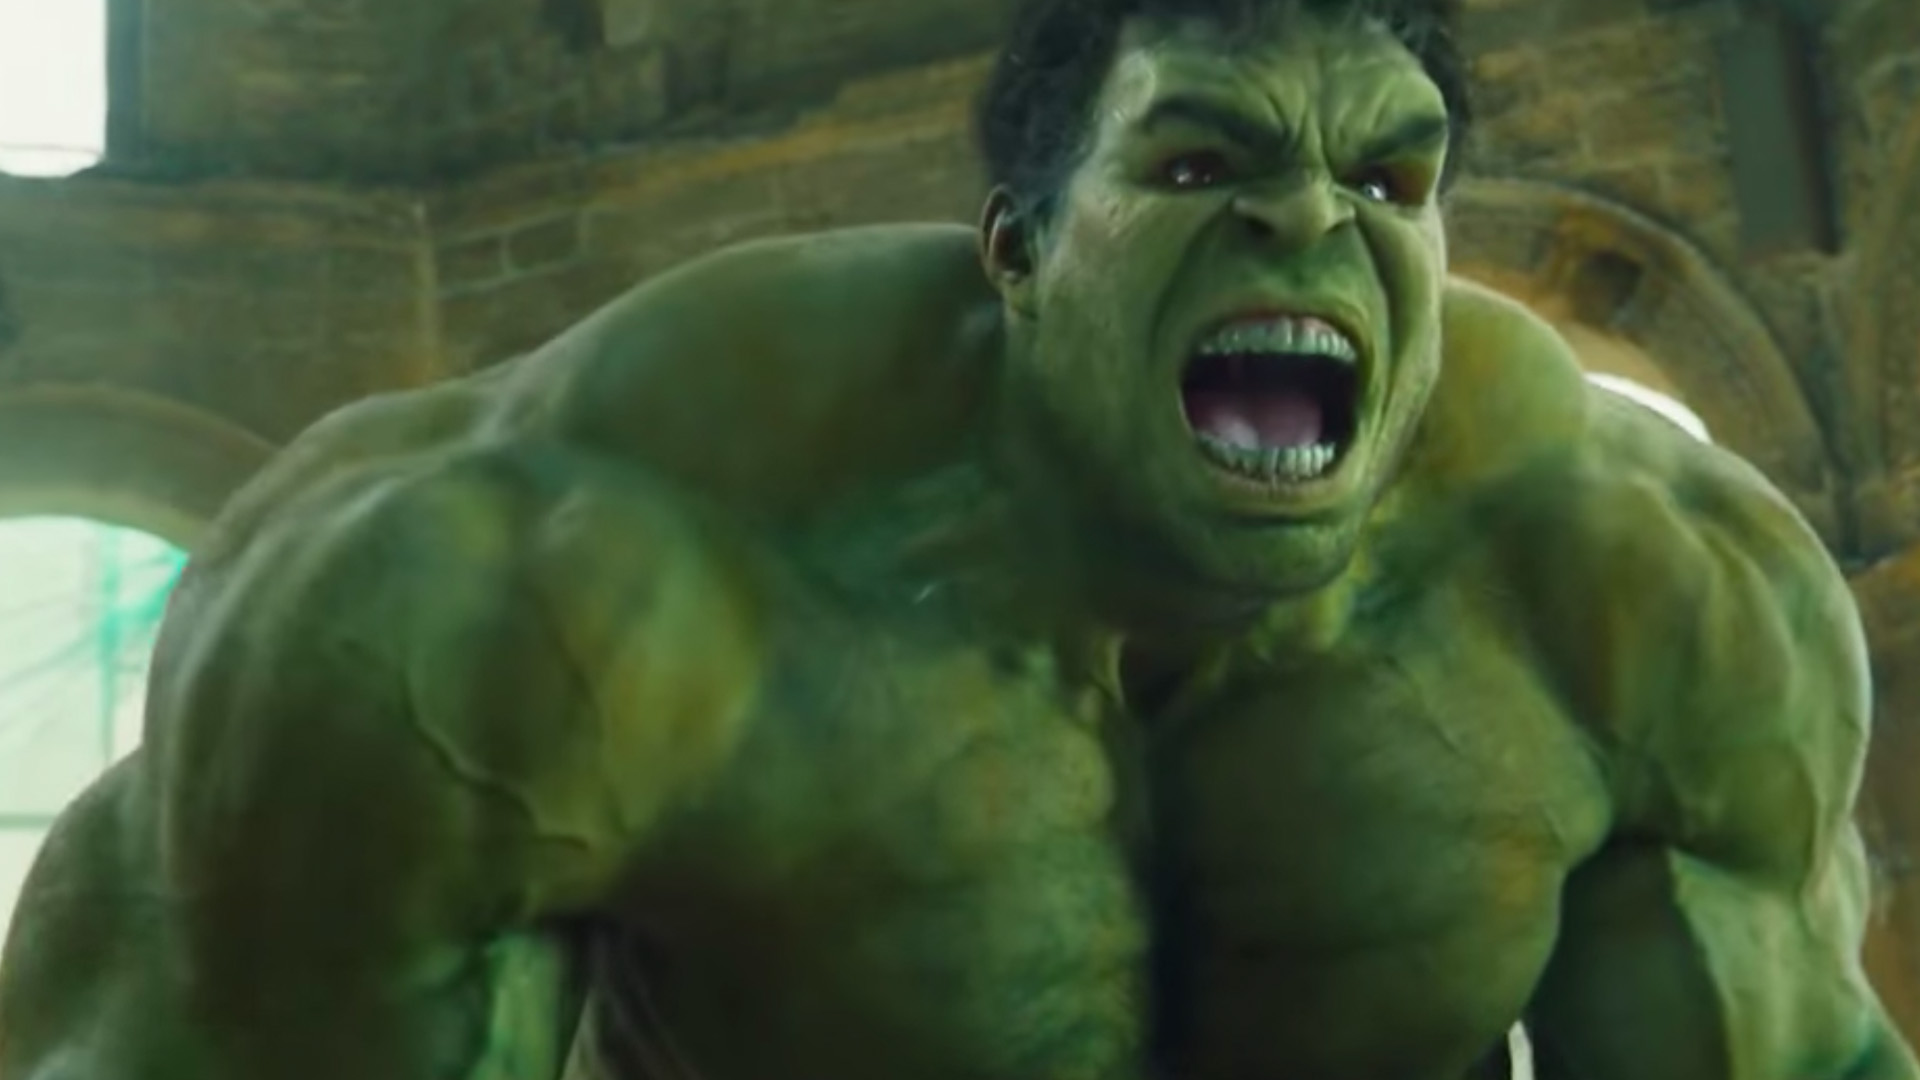 watch superman vs hulk who wins in a fight geektyrant